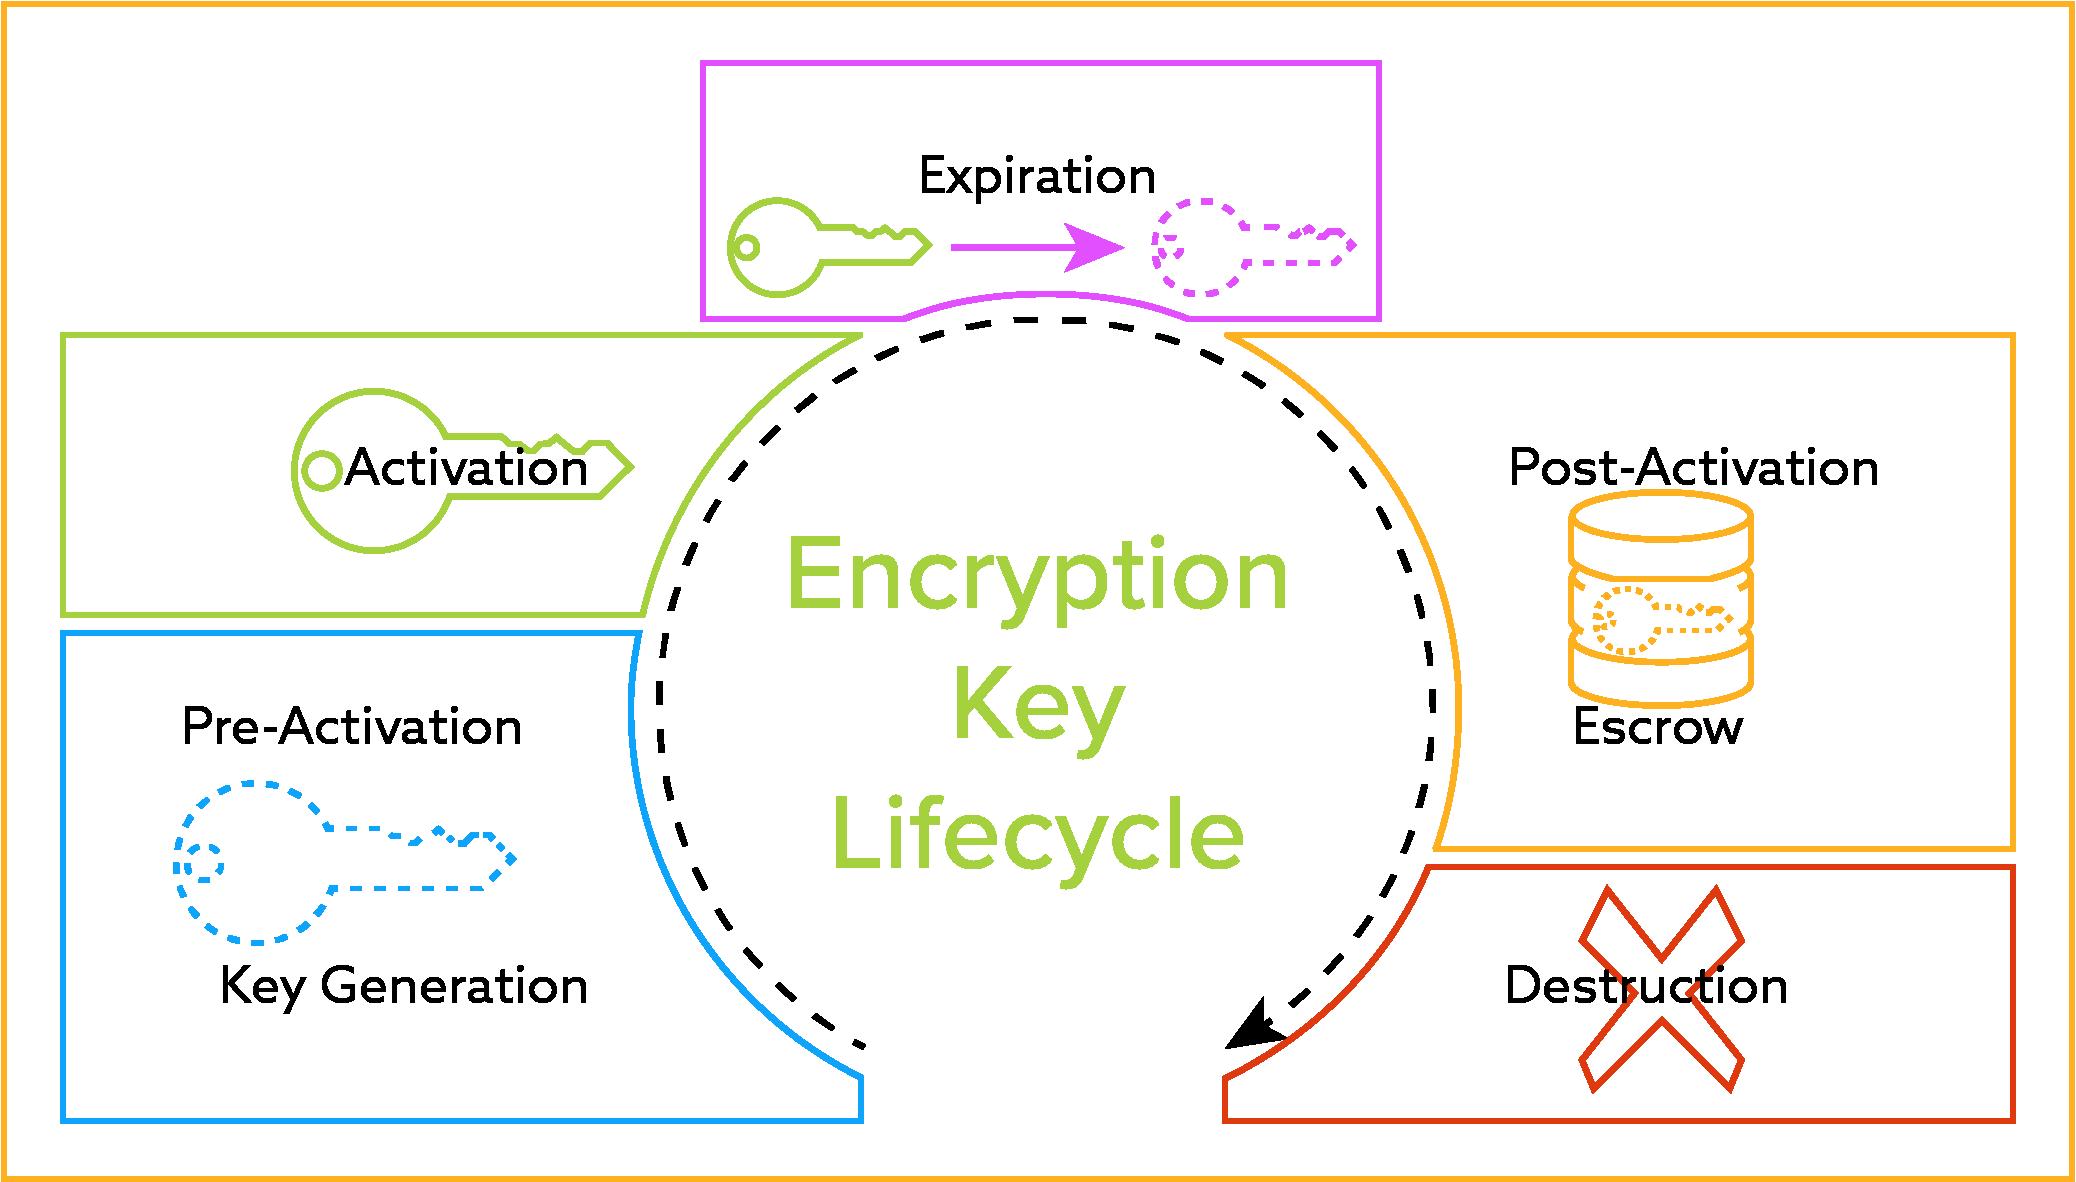 Encryption Key Lifecycle